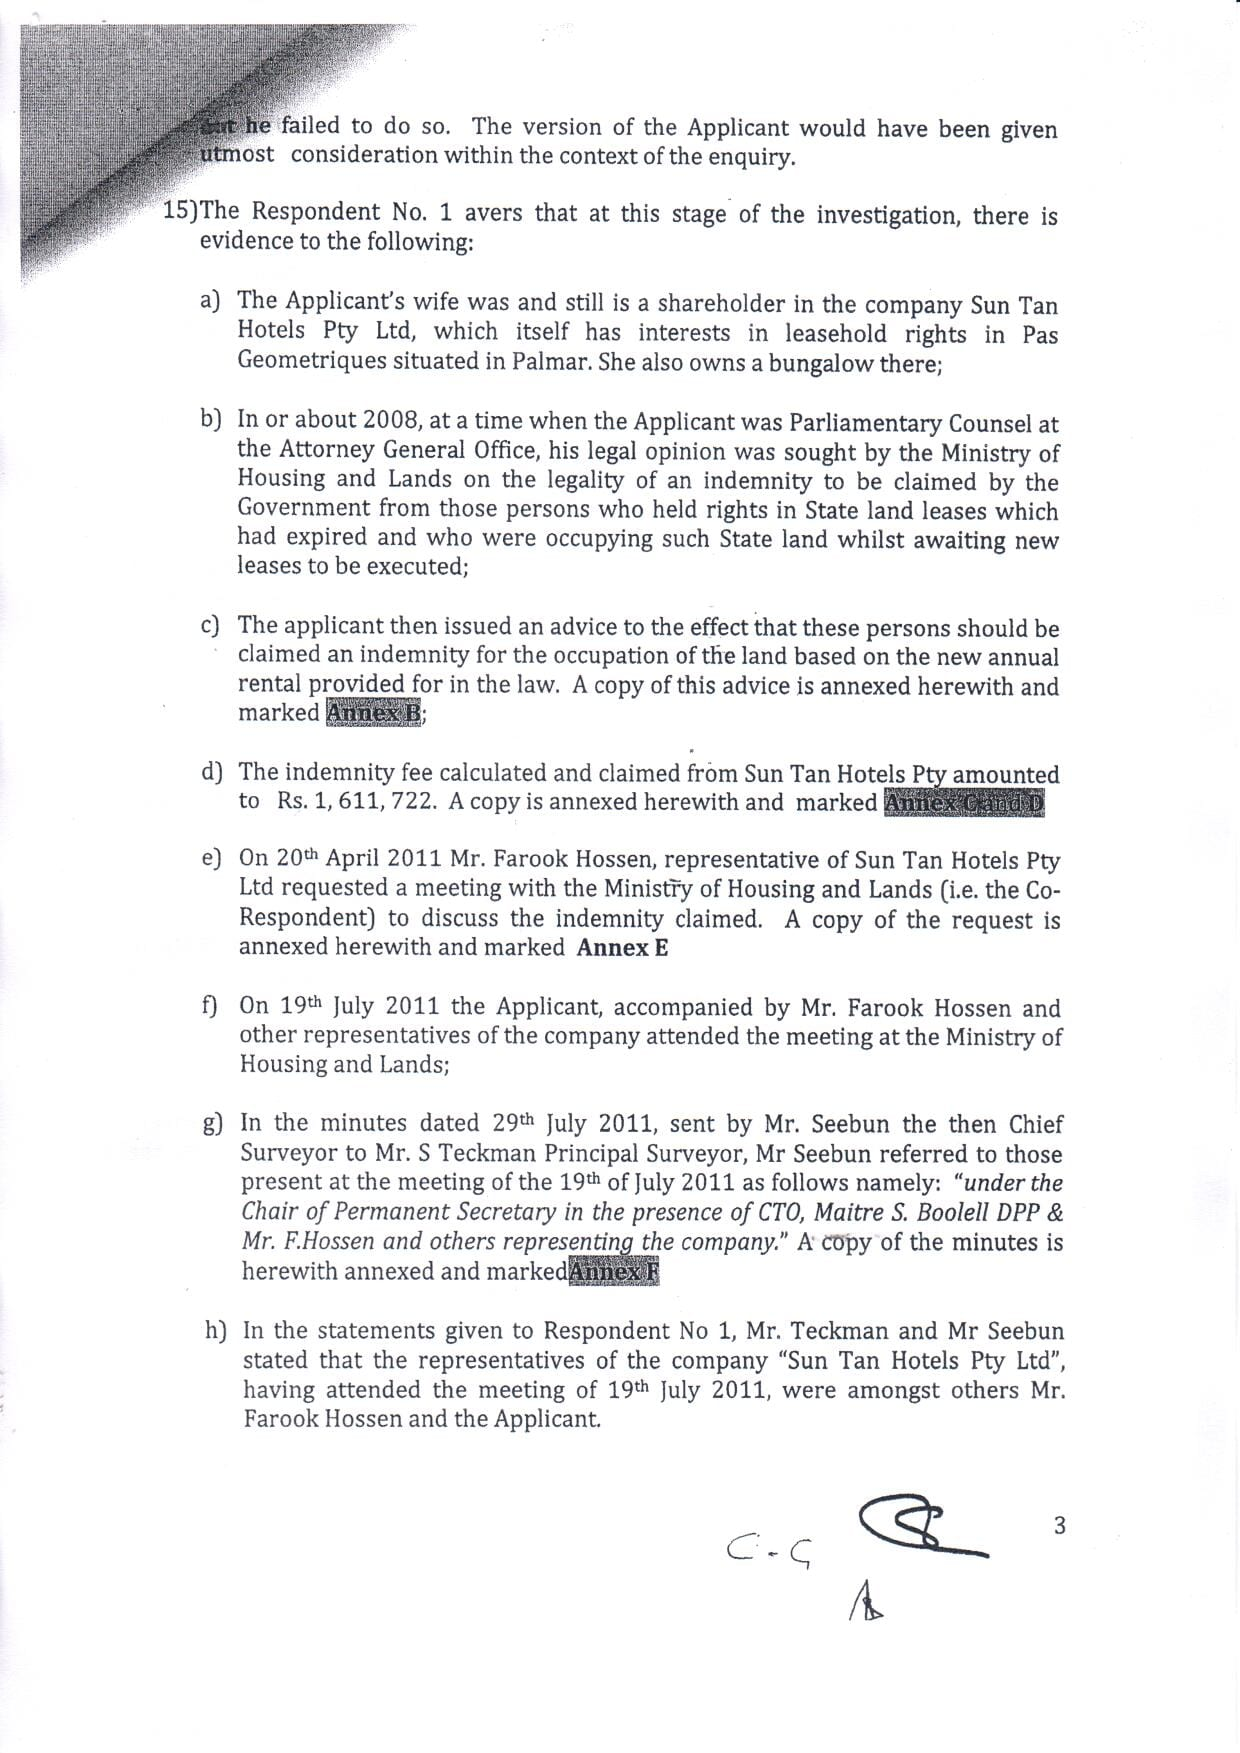 affidavit ICAC boolell 03